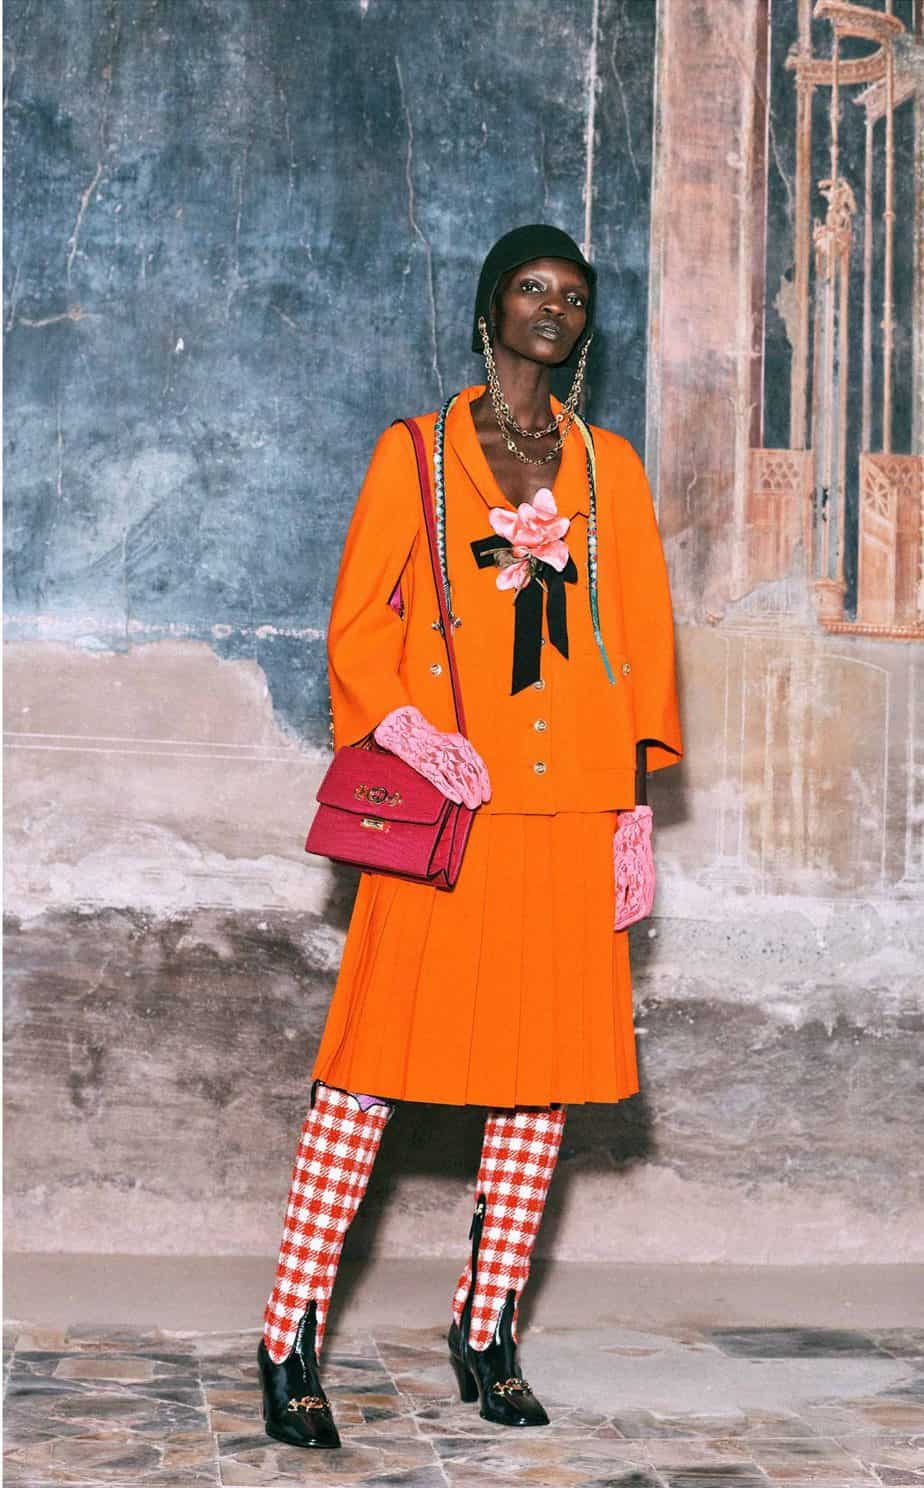 GUCCI, FALL 2019. WOMEN'S FASHION, Photographer Harmony Korine, Art Director, Christopher Simmonds - 92